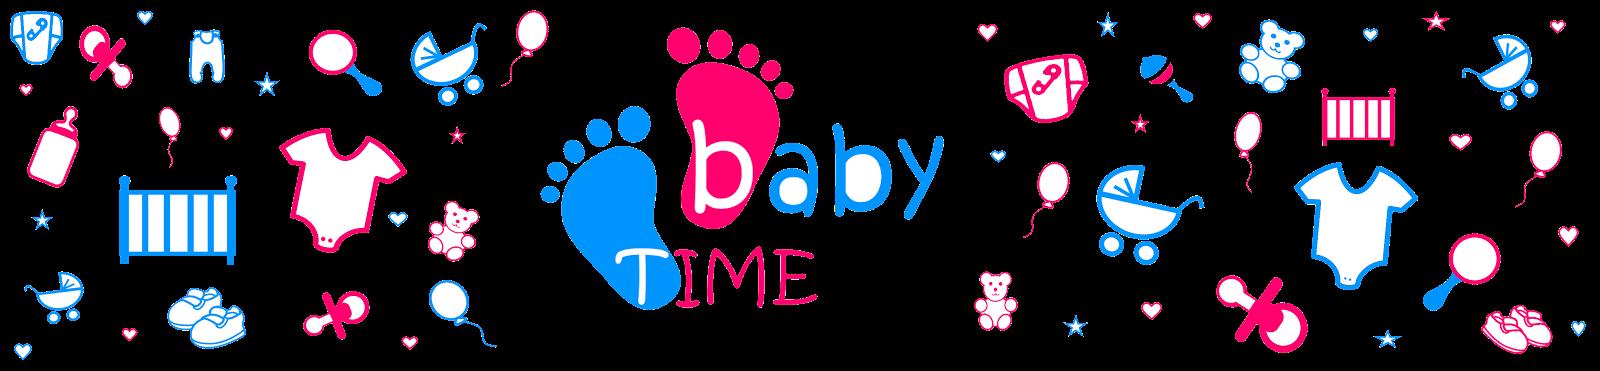 Targi Babytime-targi